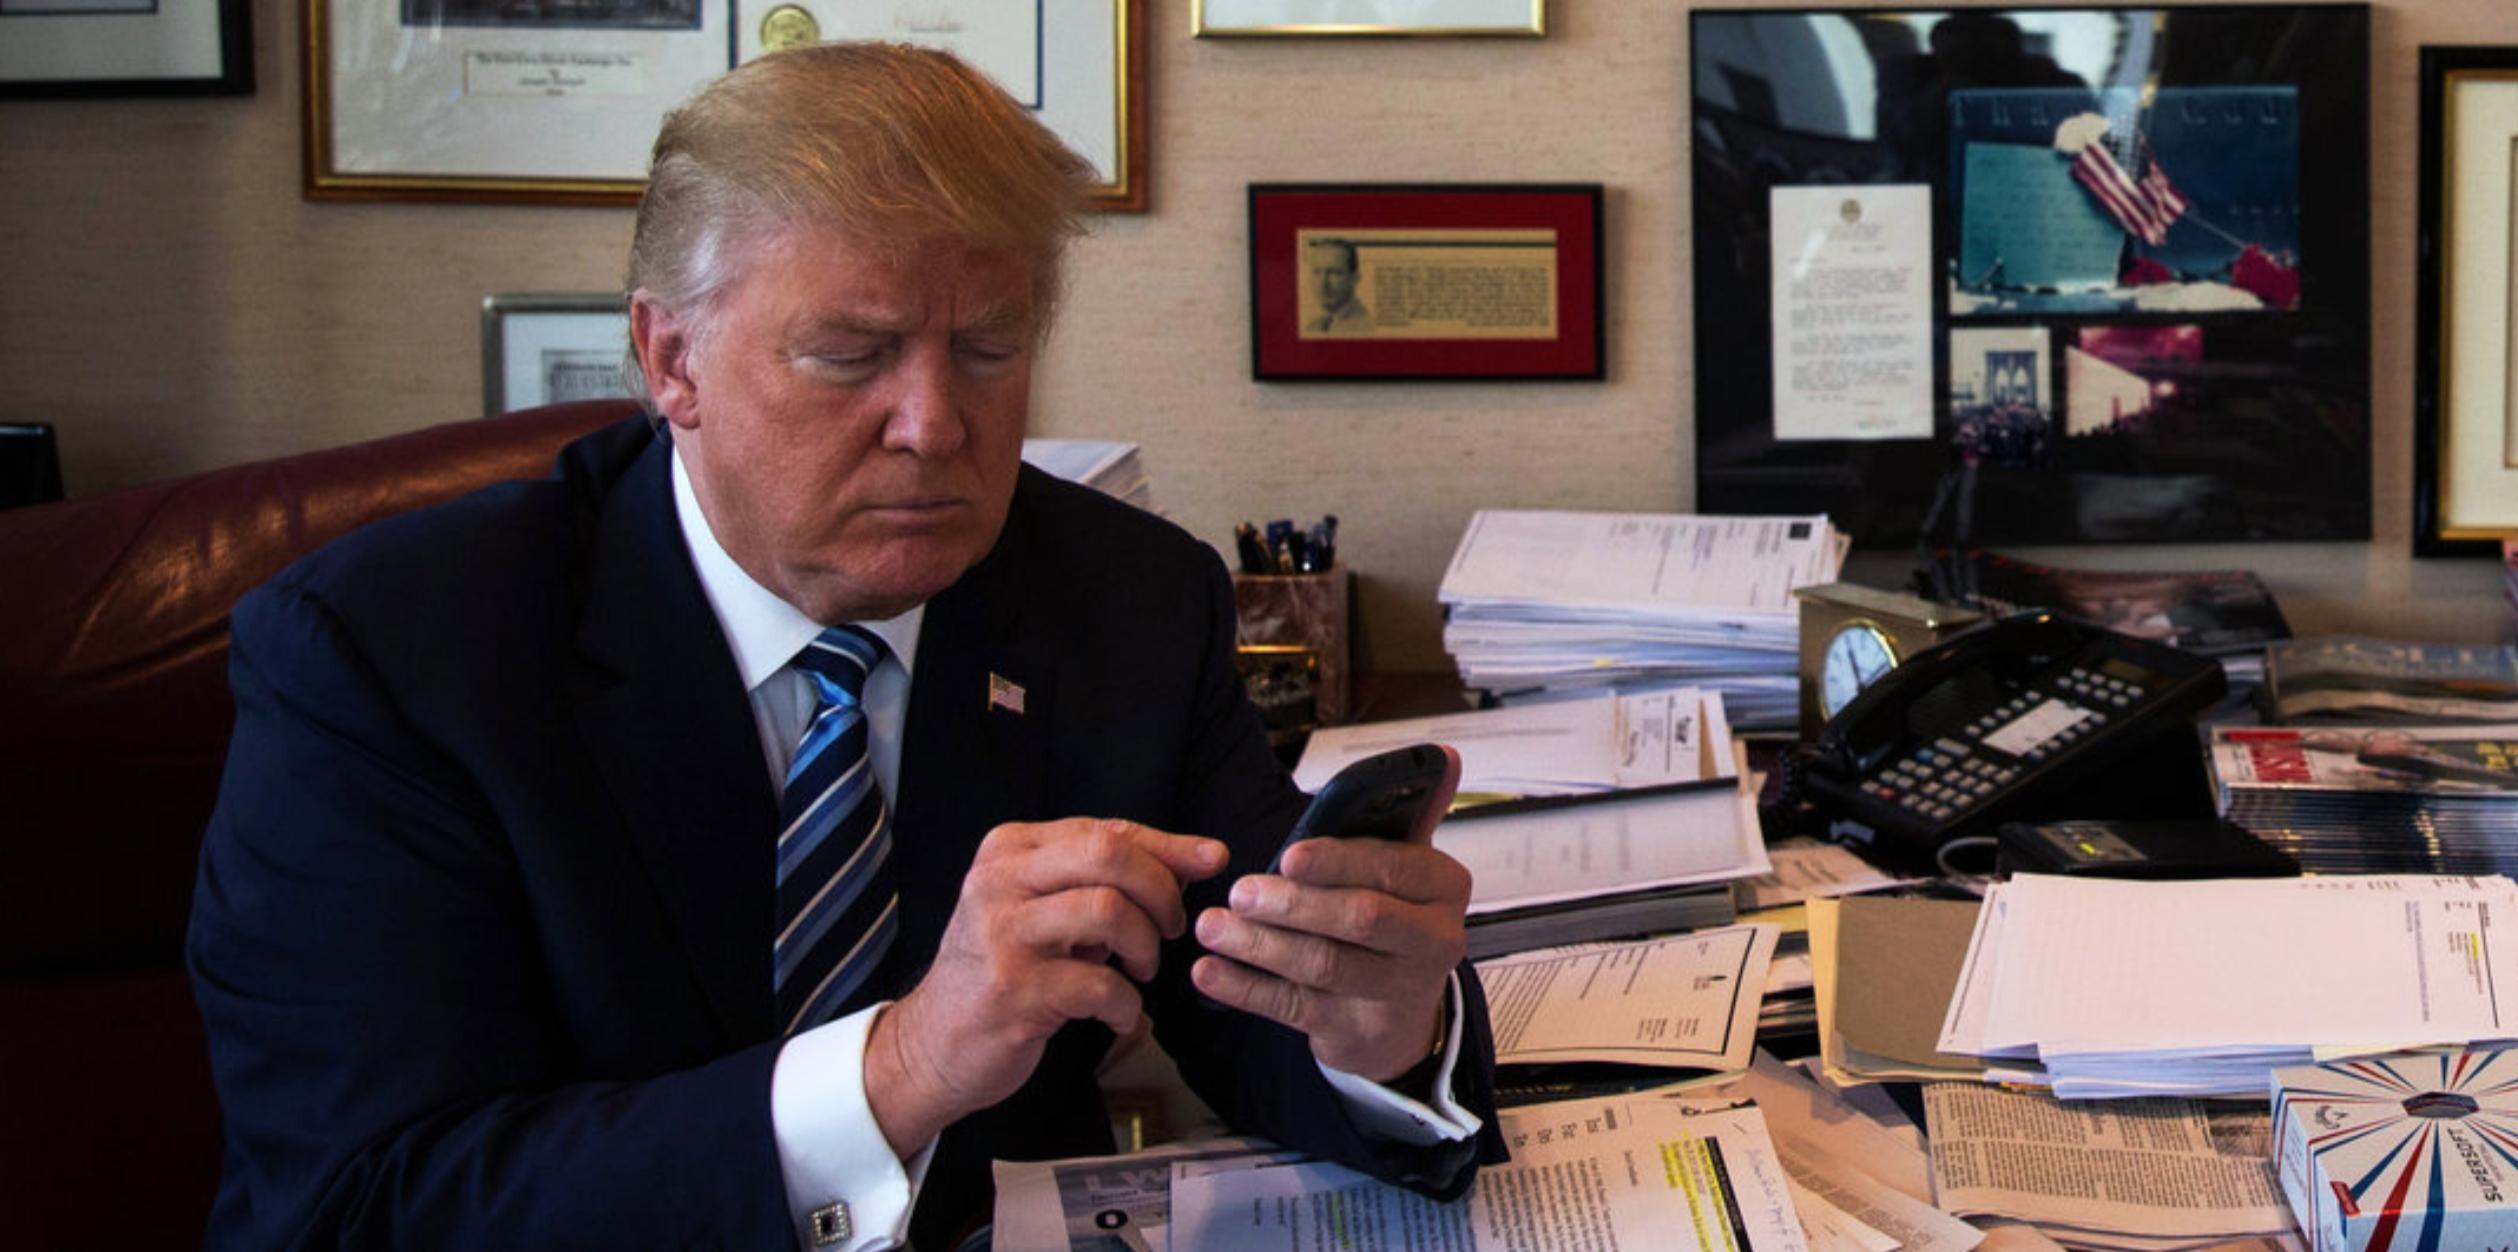 Trump quot Tweet atmaya devam edeceğim quot